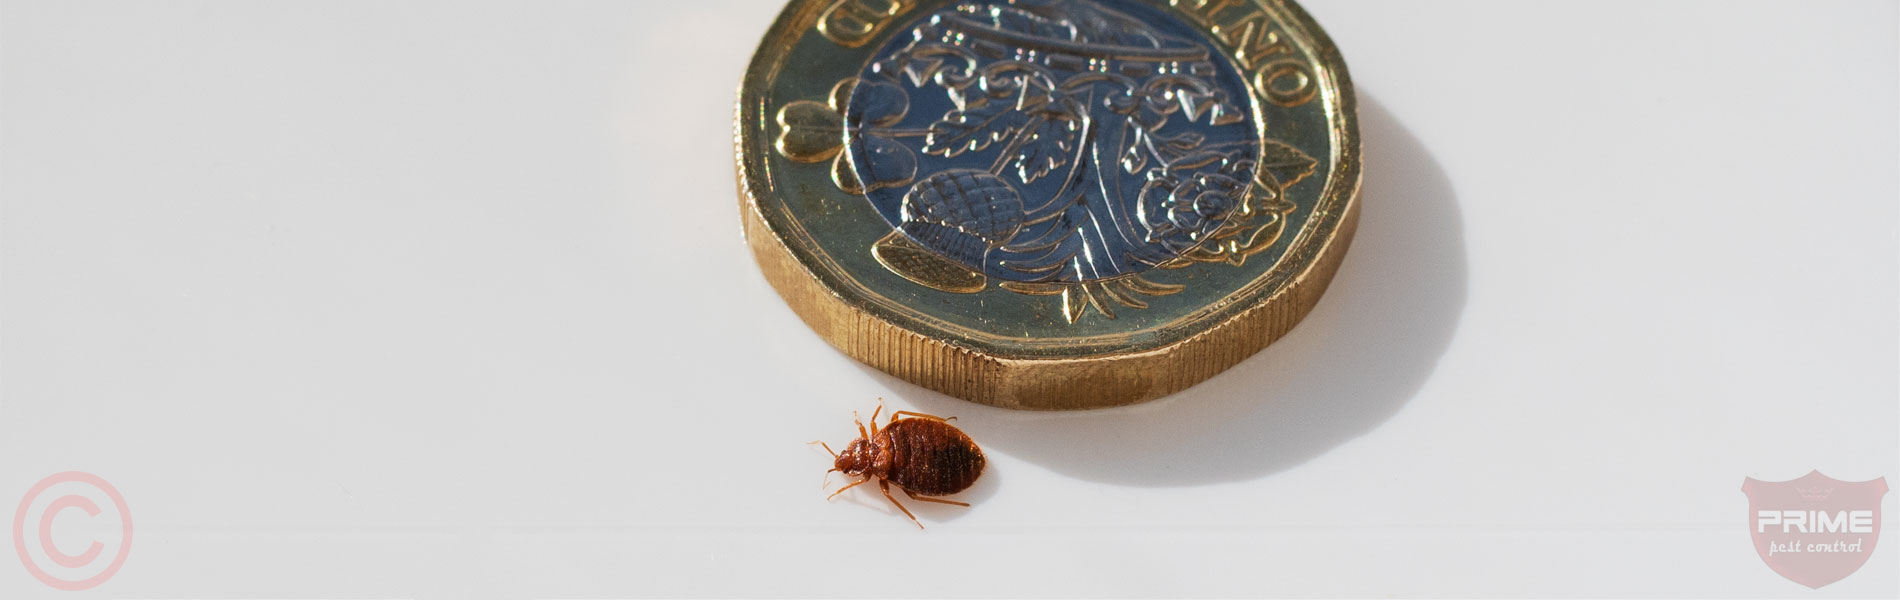 prime-pest-bed-bug-macro1